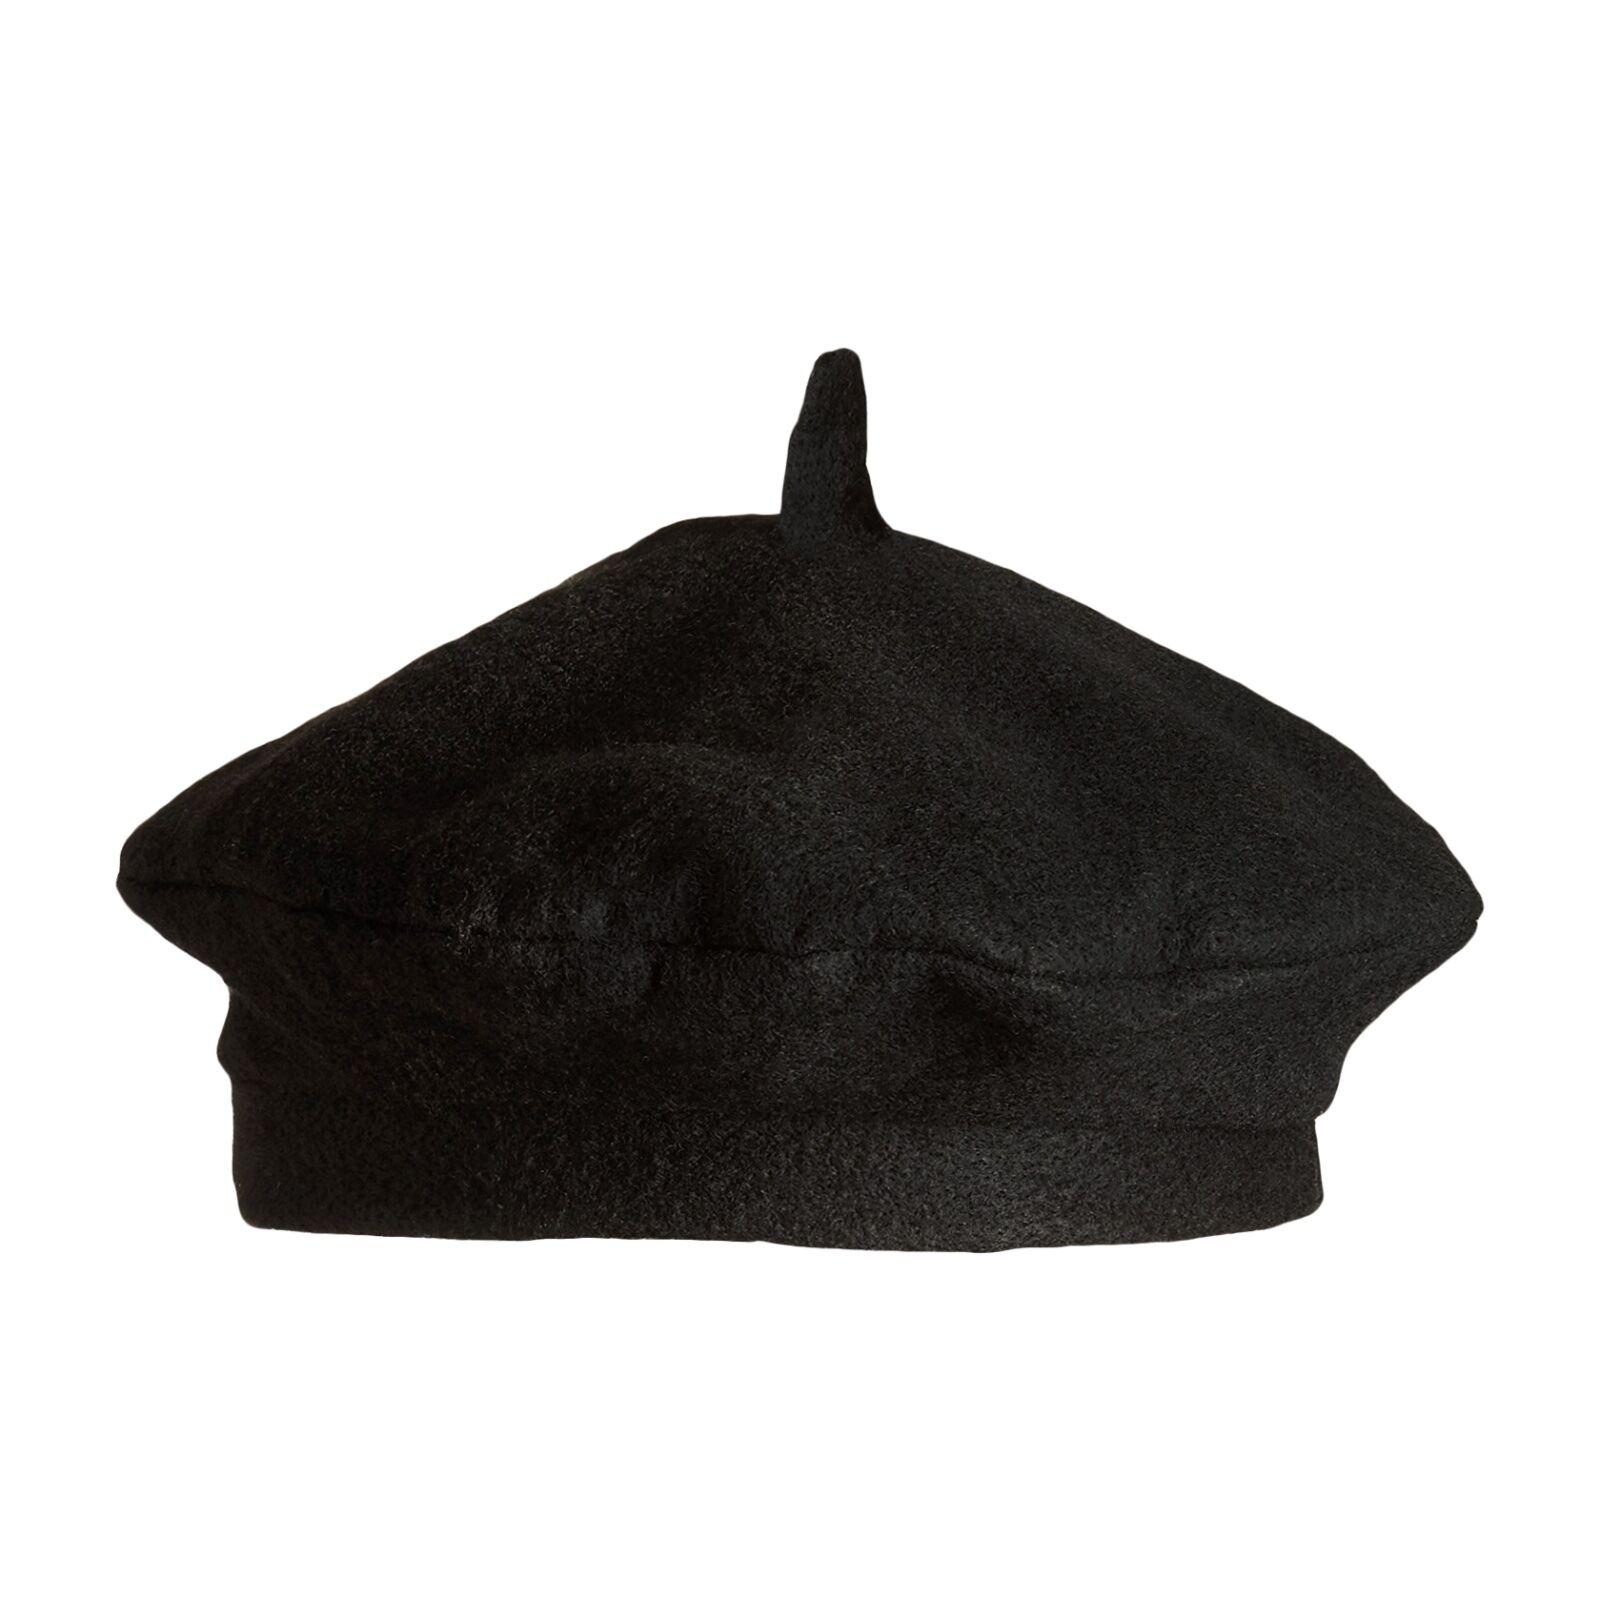 df10b2b655c Details about Black Felt Beret French Frenchman Artist Painter Fancy Dress  Hat